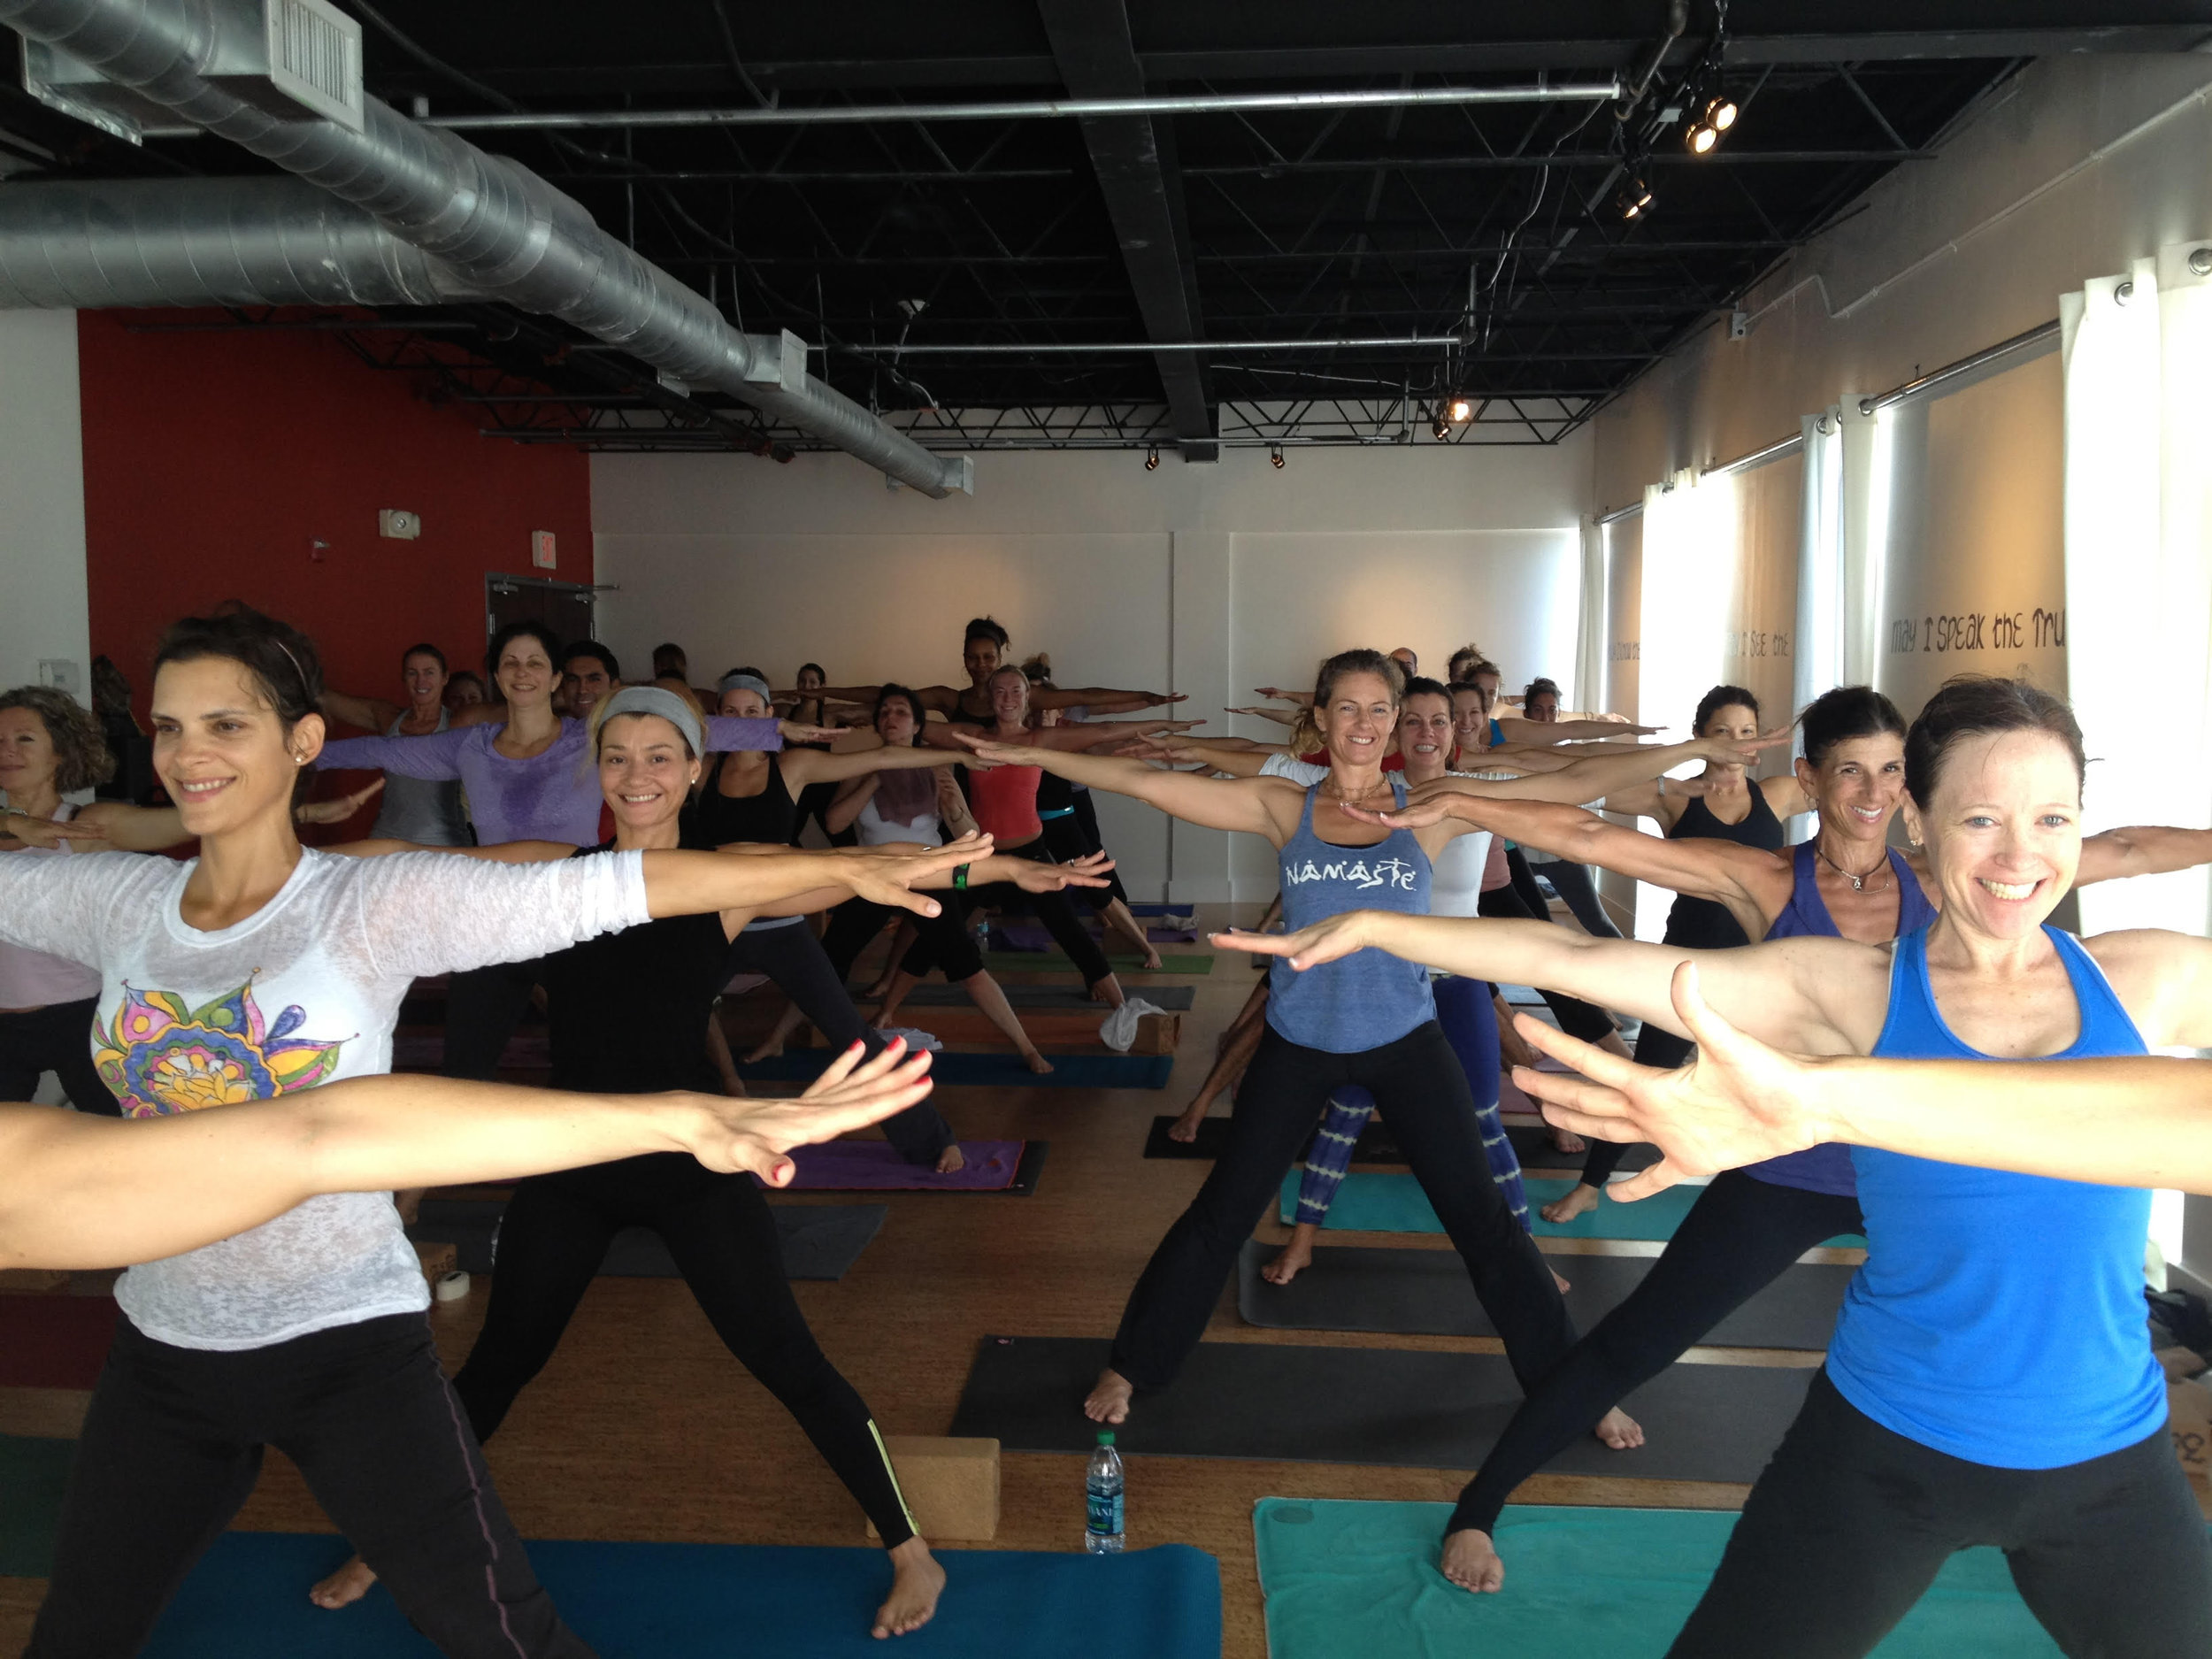 biscayne yoga smiles.jpg